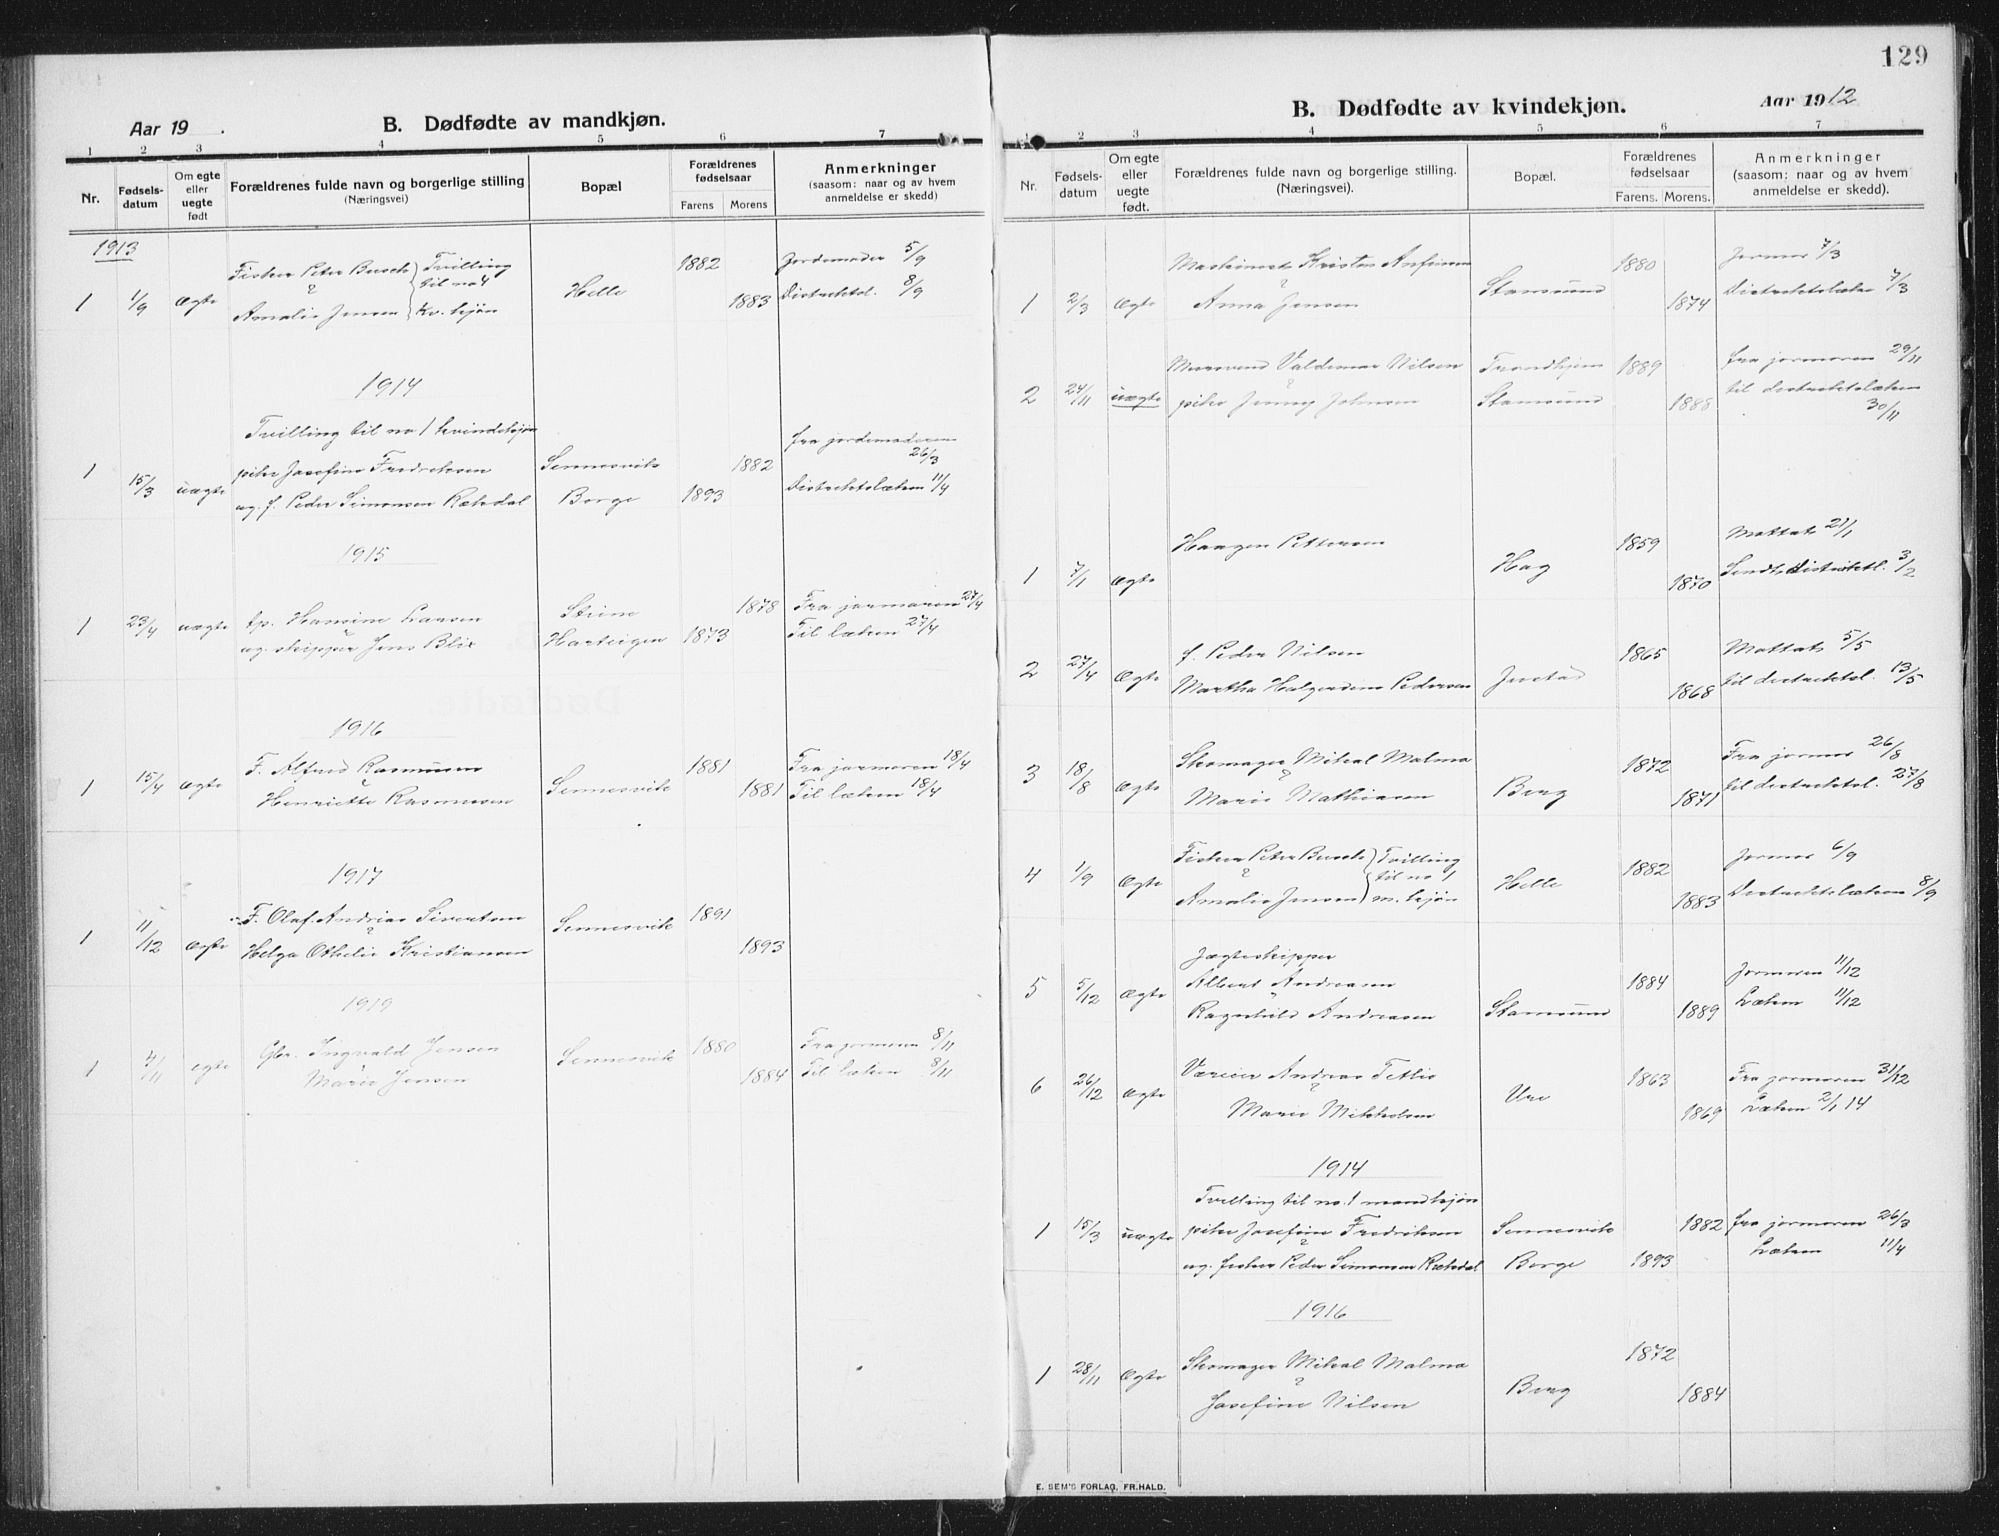 SAT, Ministerialprotokoller, klokkerbøker og fødselsregistre - Nordland, 882/L1183: Klokkerbok nr. 882C01, 1911-1938, s. 129